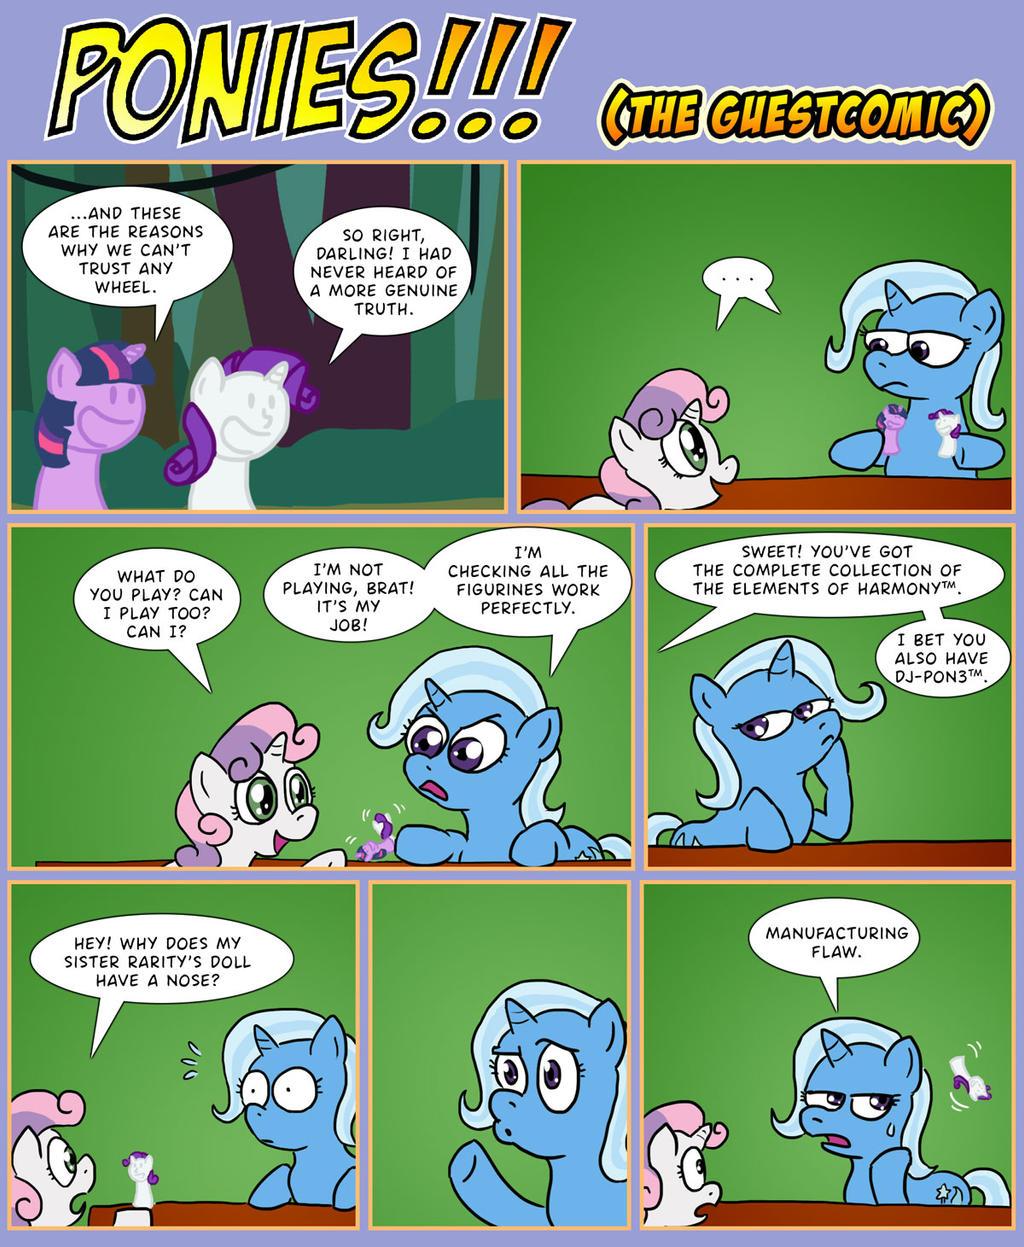 PONIES!!! - The guestcomic